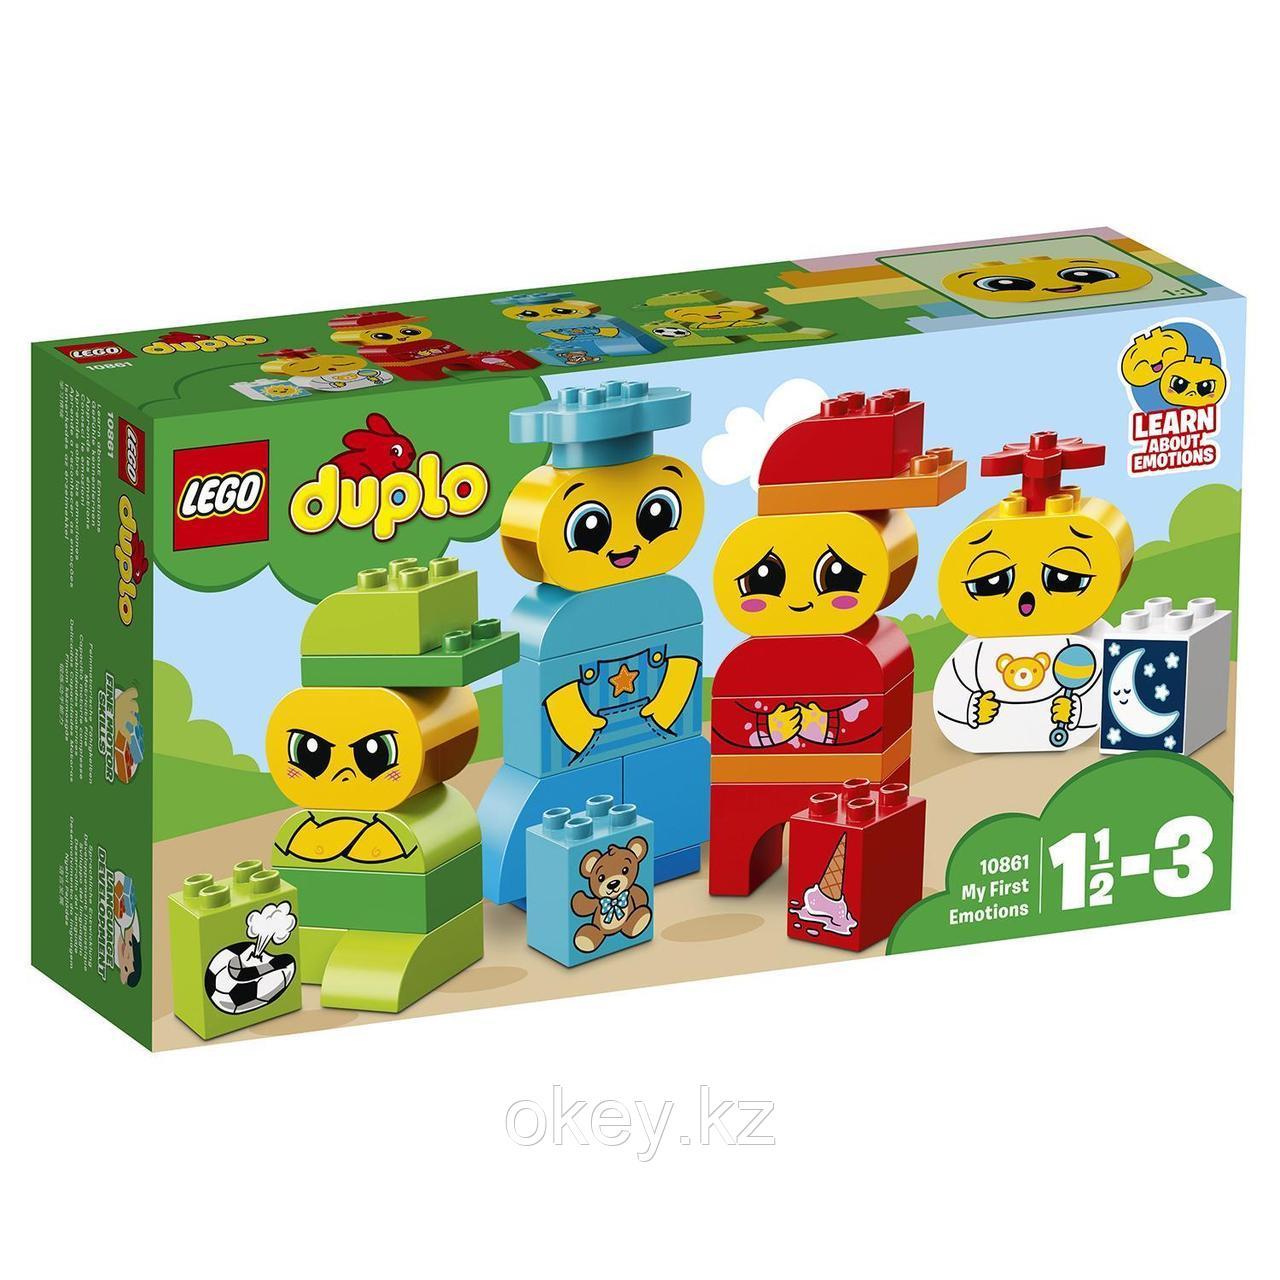 LEGO Duplo: Мои первые эмоции 10861